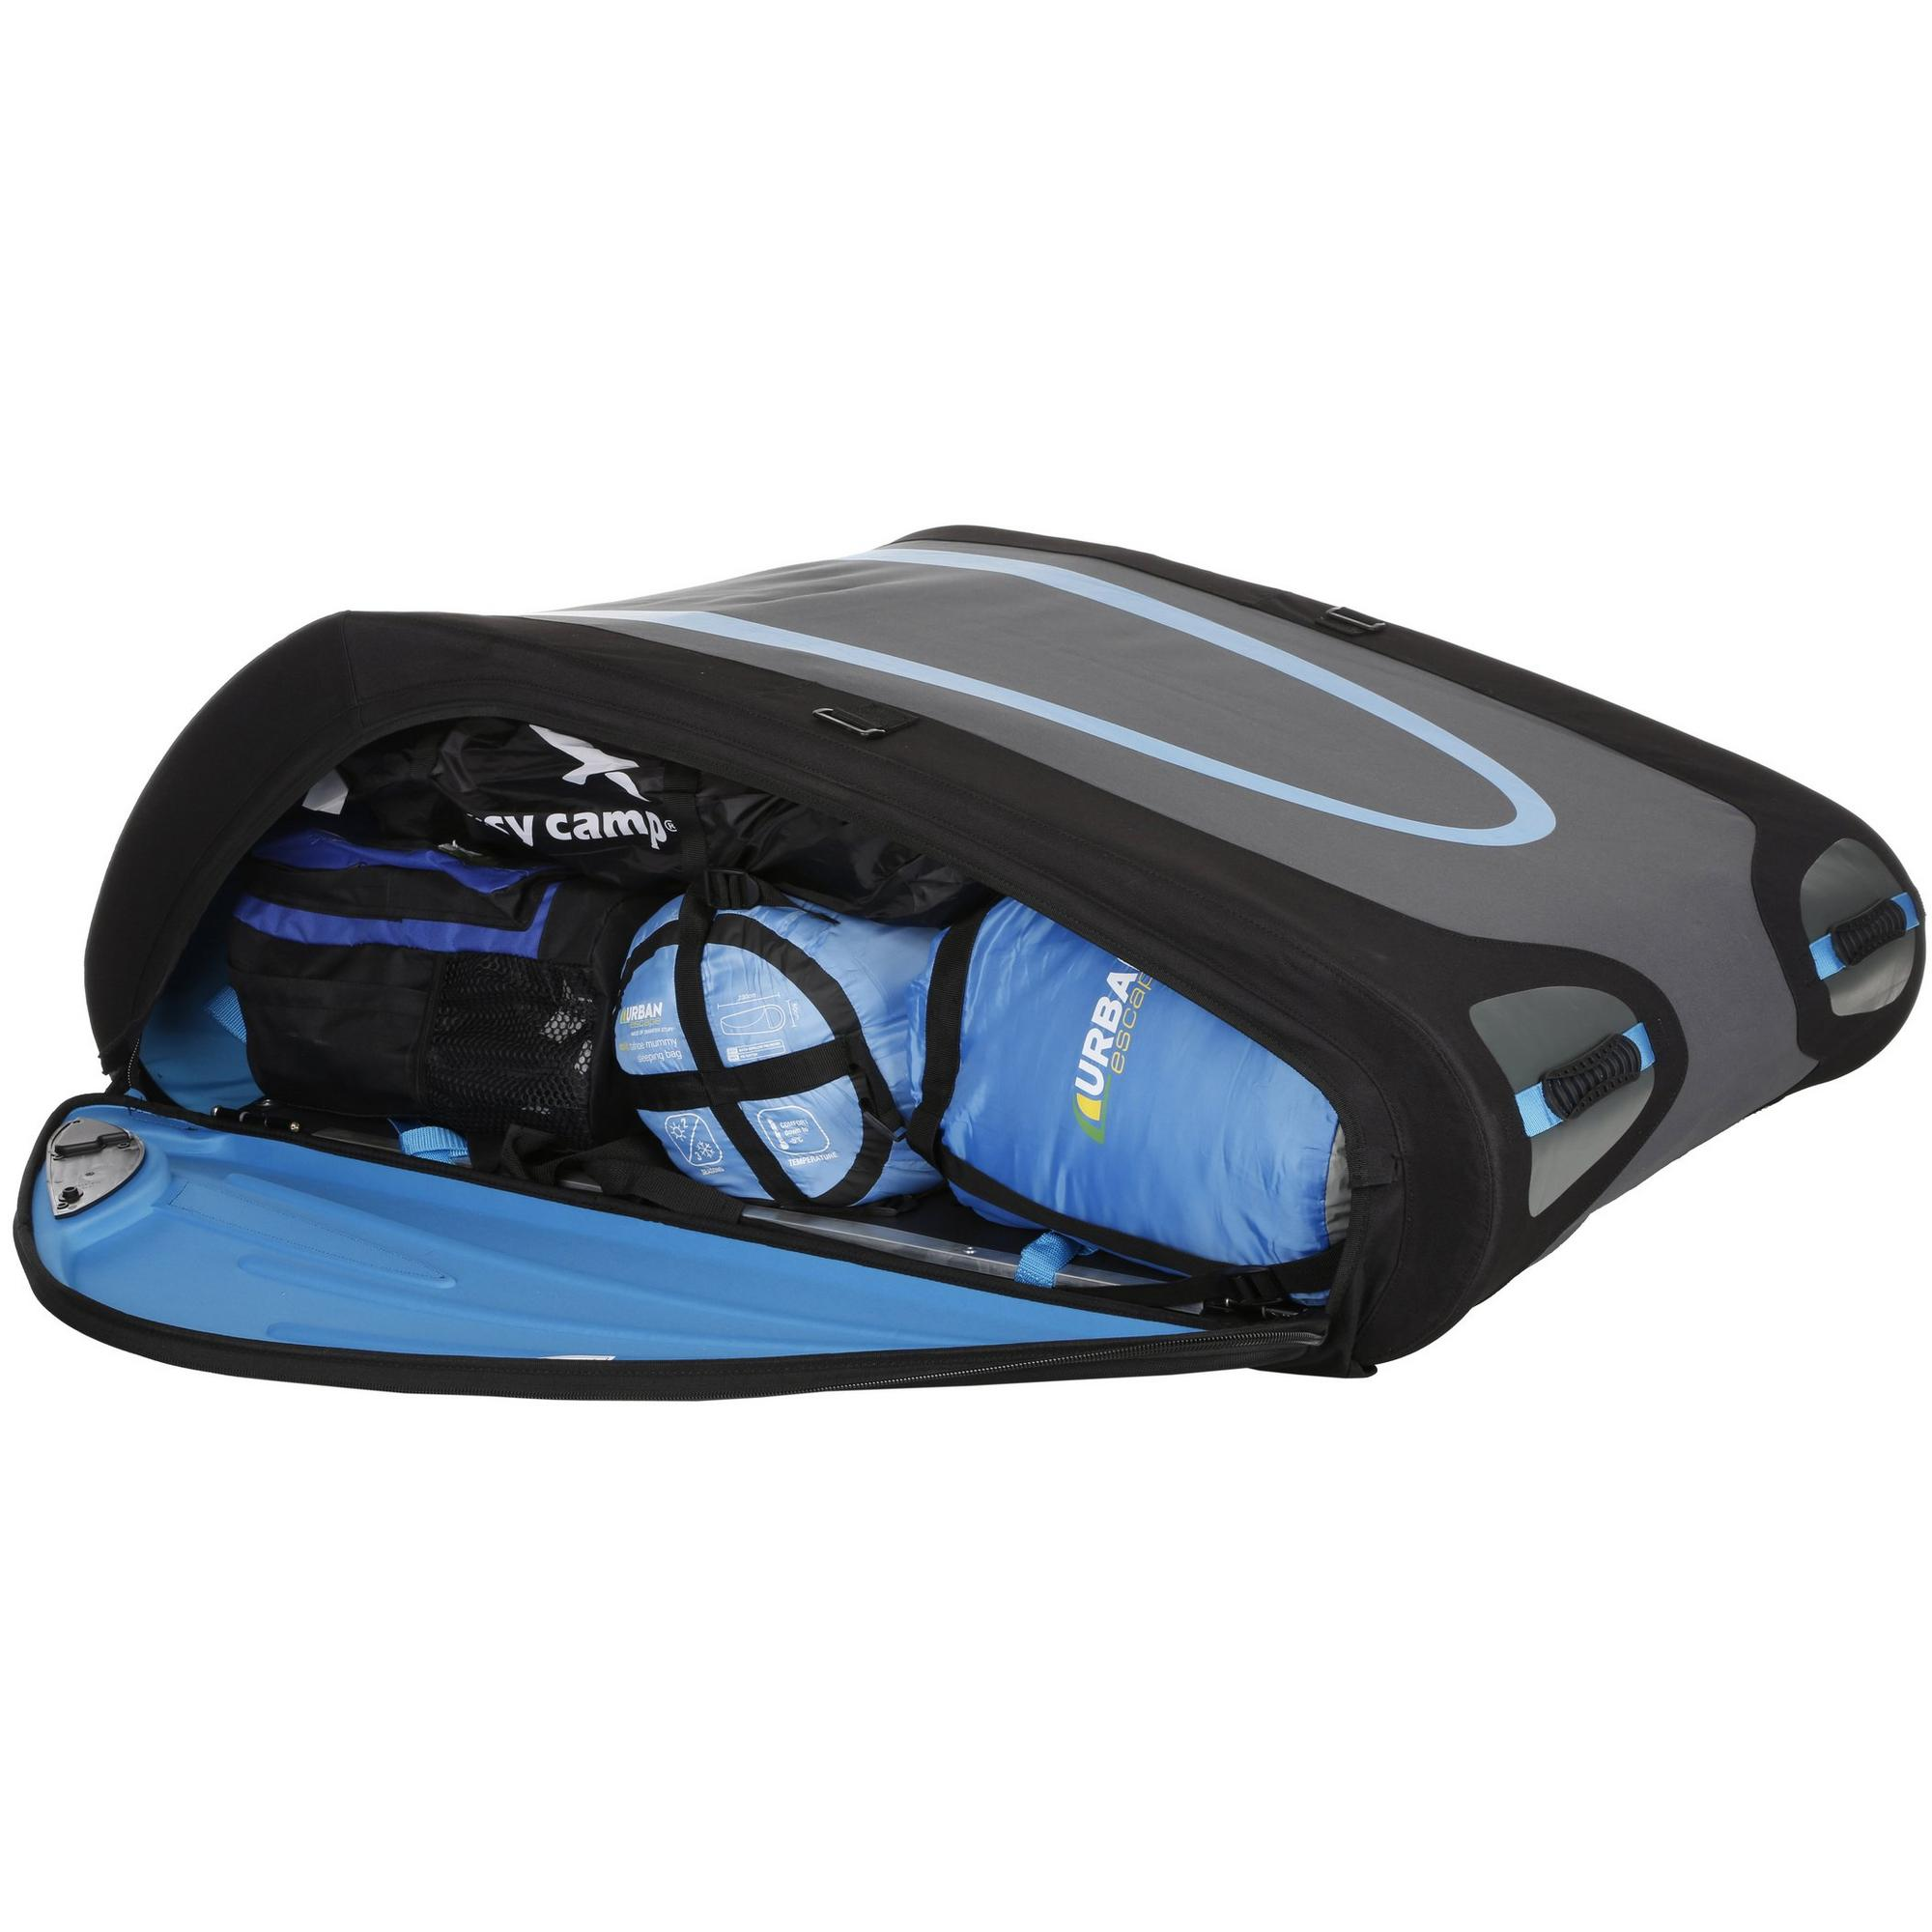 Bag Foldable Box About 370l Litre Flex Cargo Top Luggage Storage Lockable Roof Details Bermude QdCrWoexB